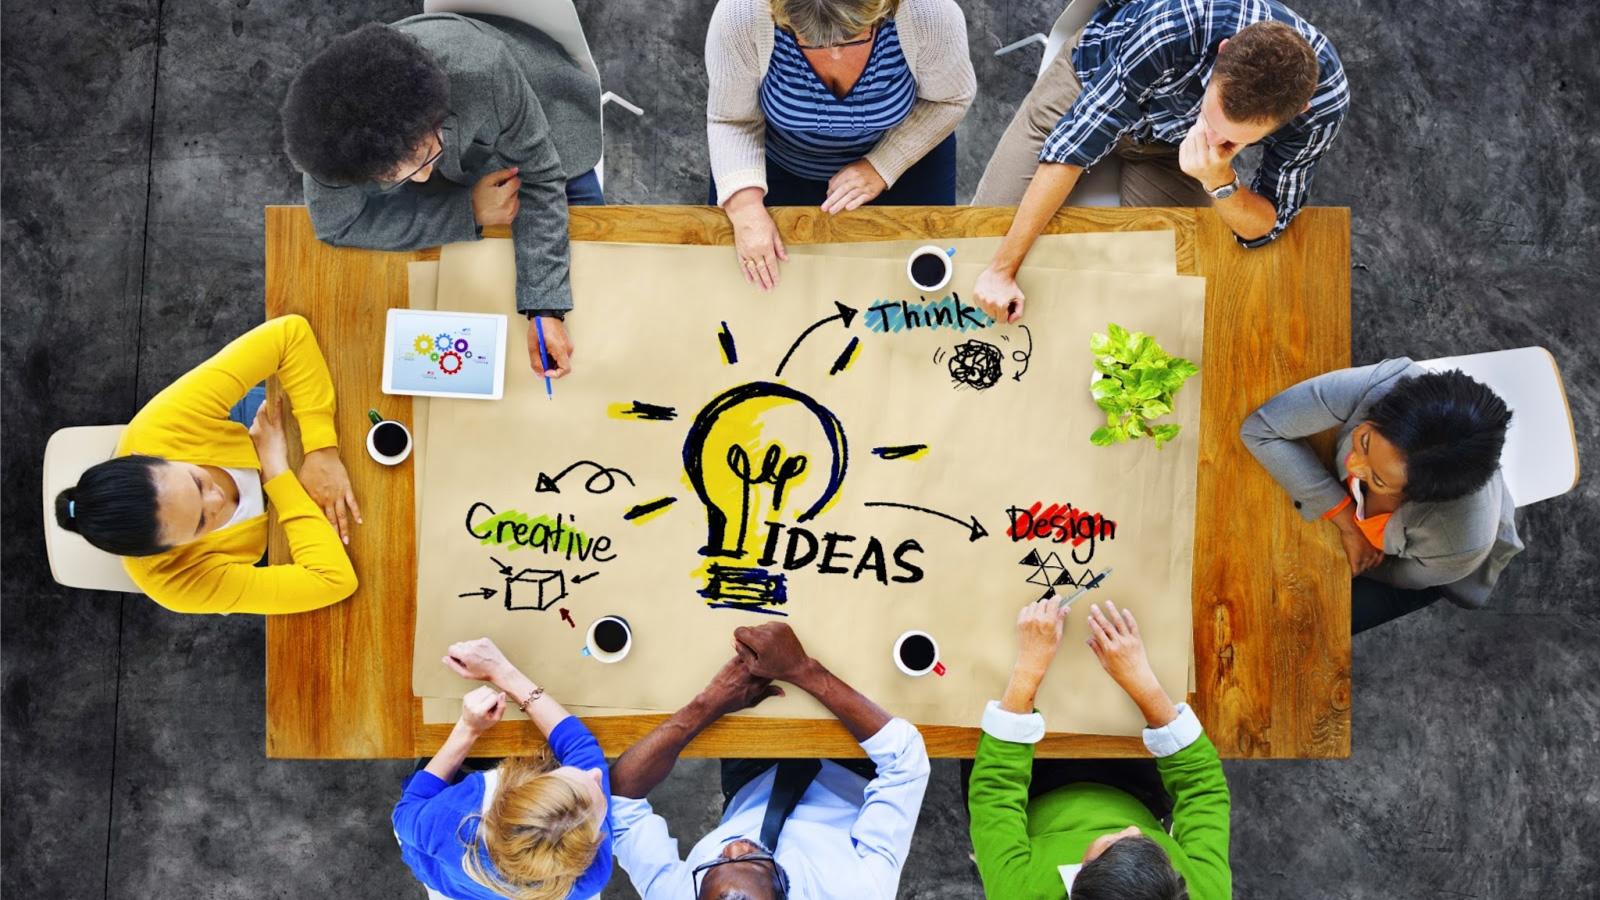 Mengapa Anda tidak perlu menjadi kreatif untuk melakukan pekerjaan kreatif